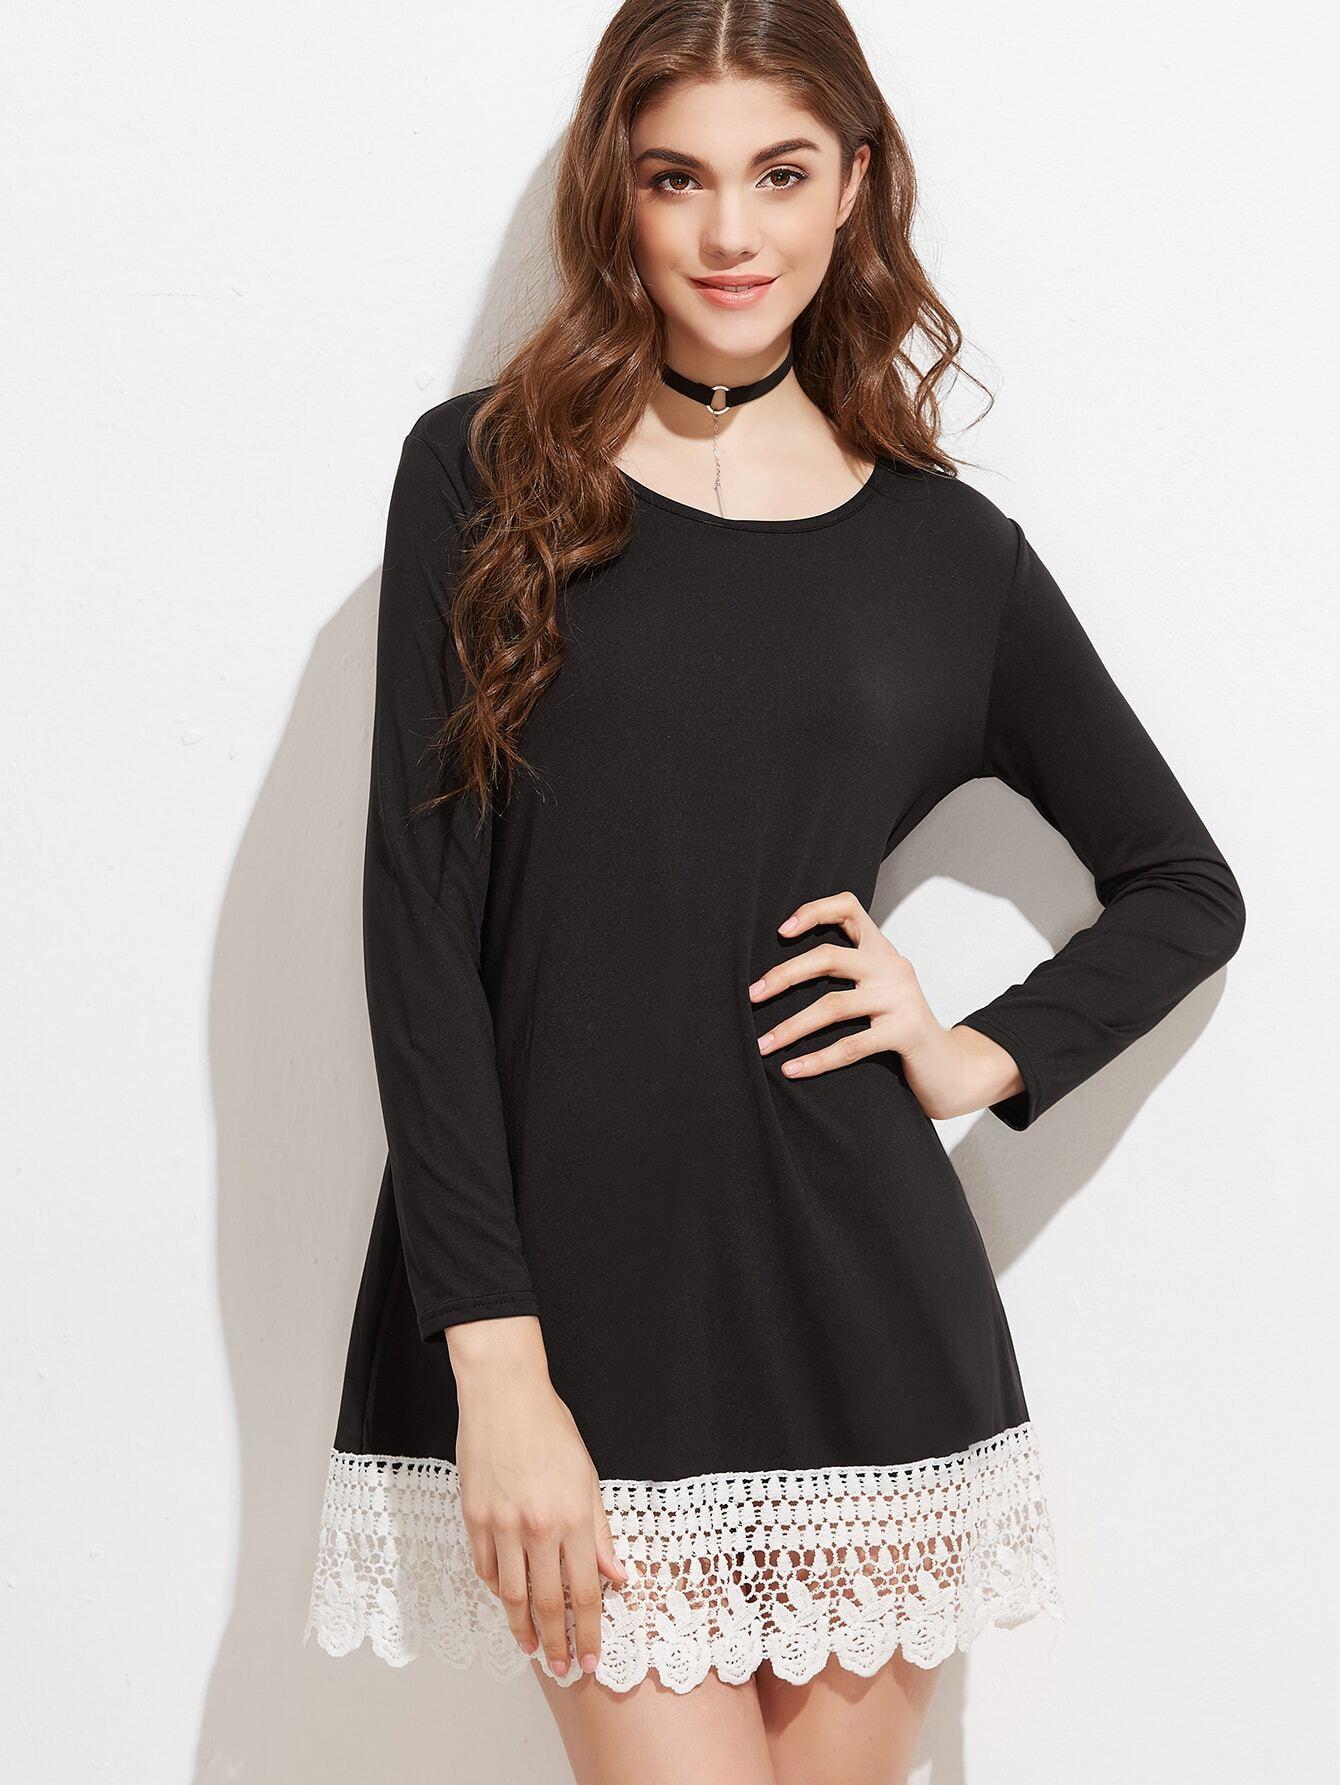 Black Contrast Lace Hem Tee DressBlack Contrast Lace Hem Tee Dress<br><br>color: Black<br>size: S,XL